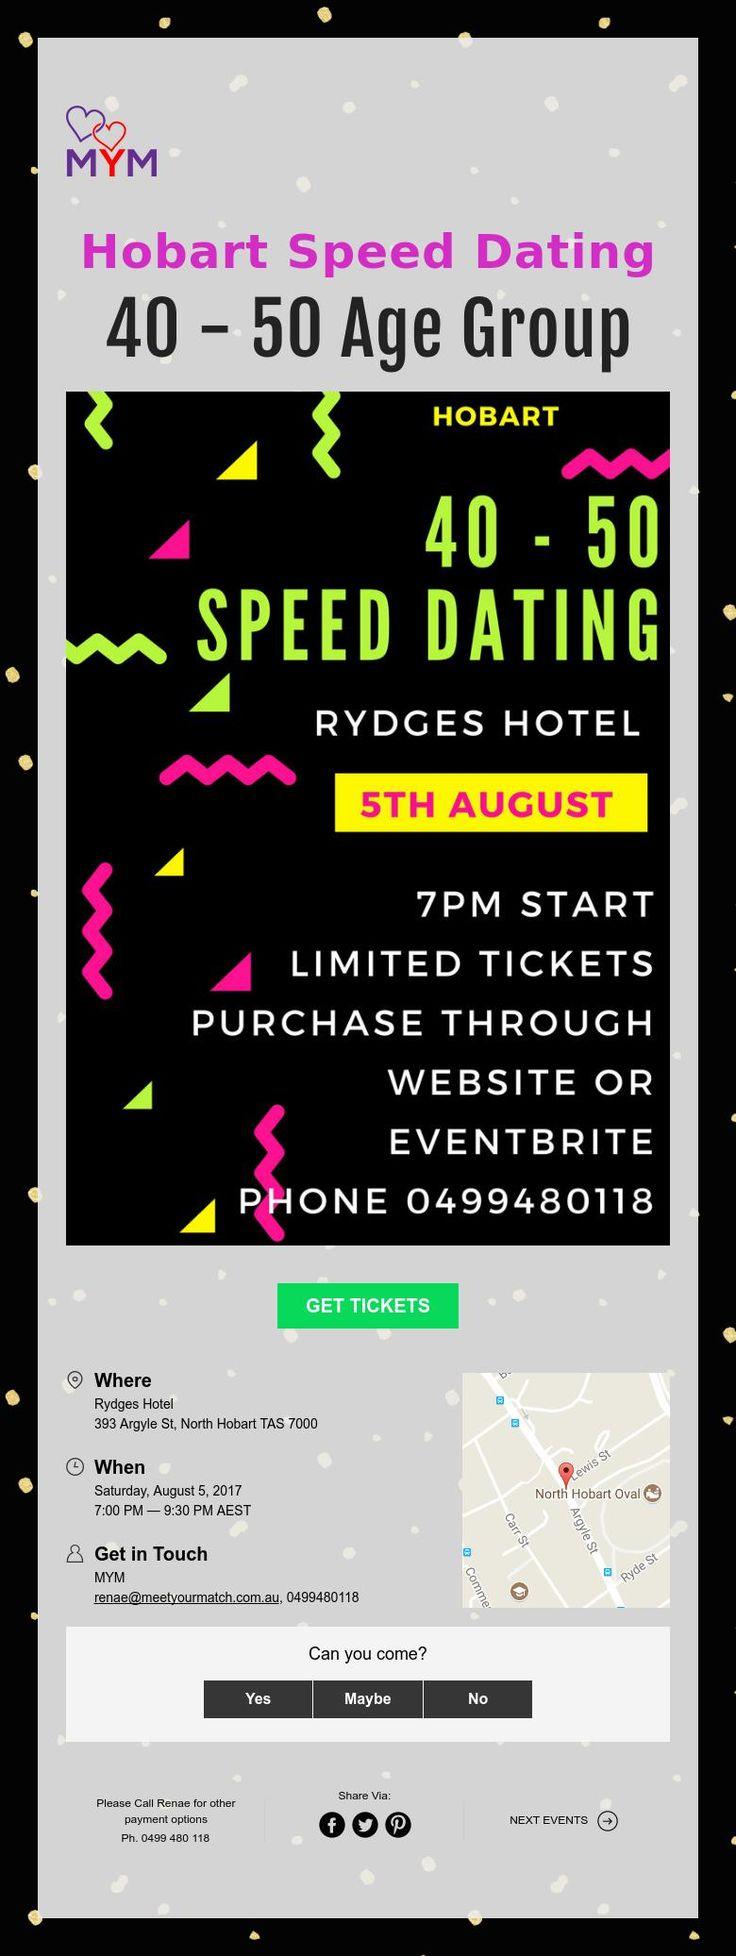 Speed dating in dayton ohio